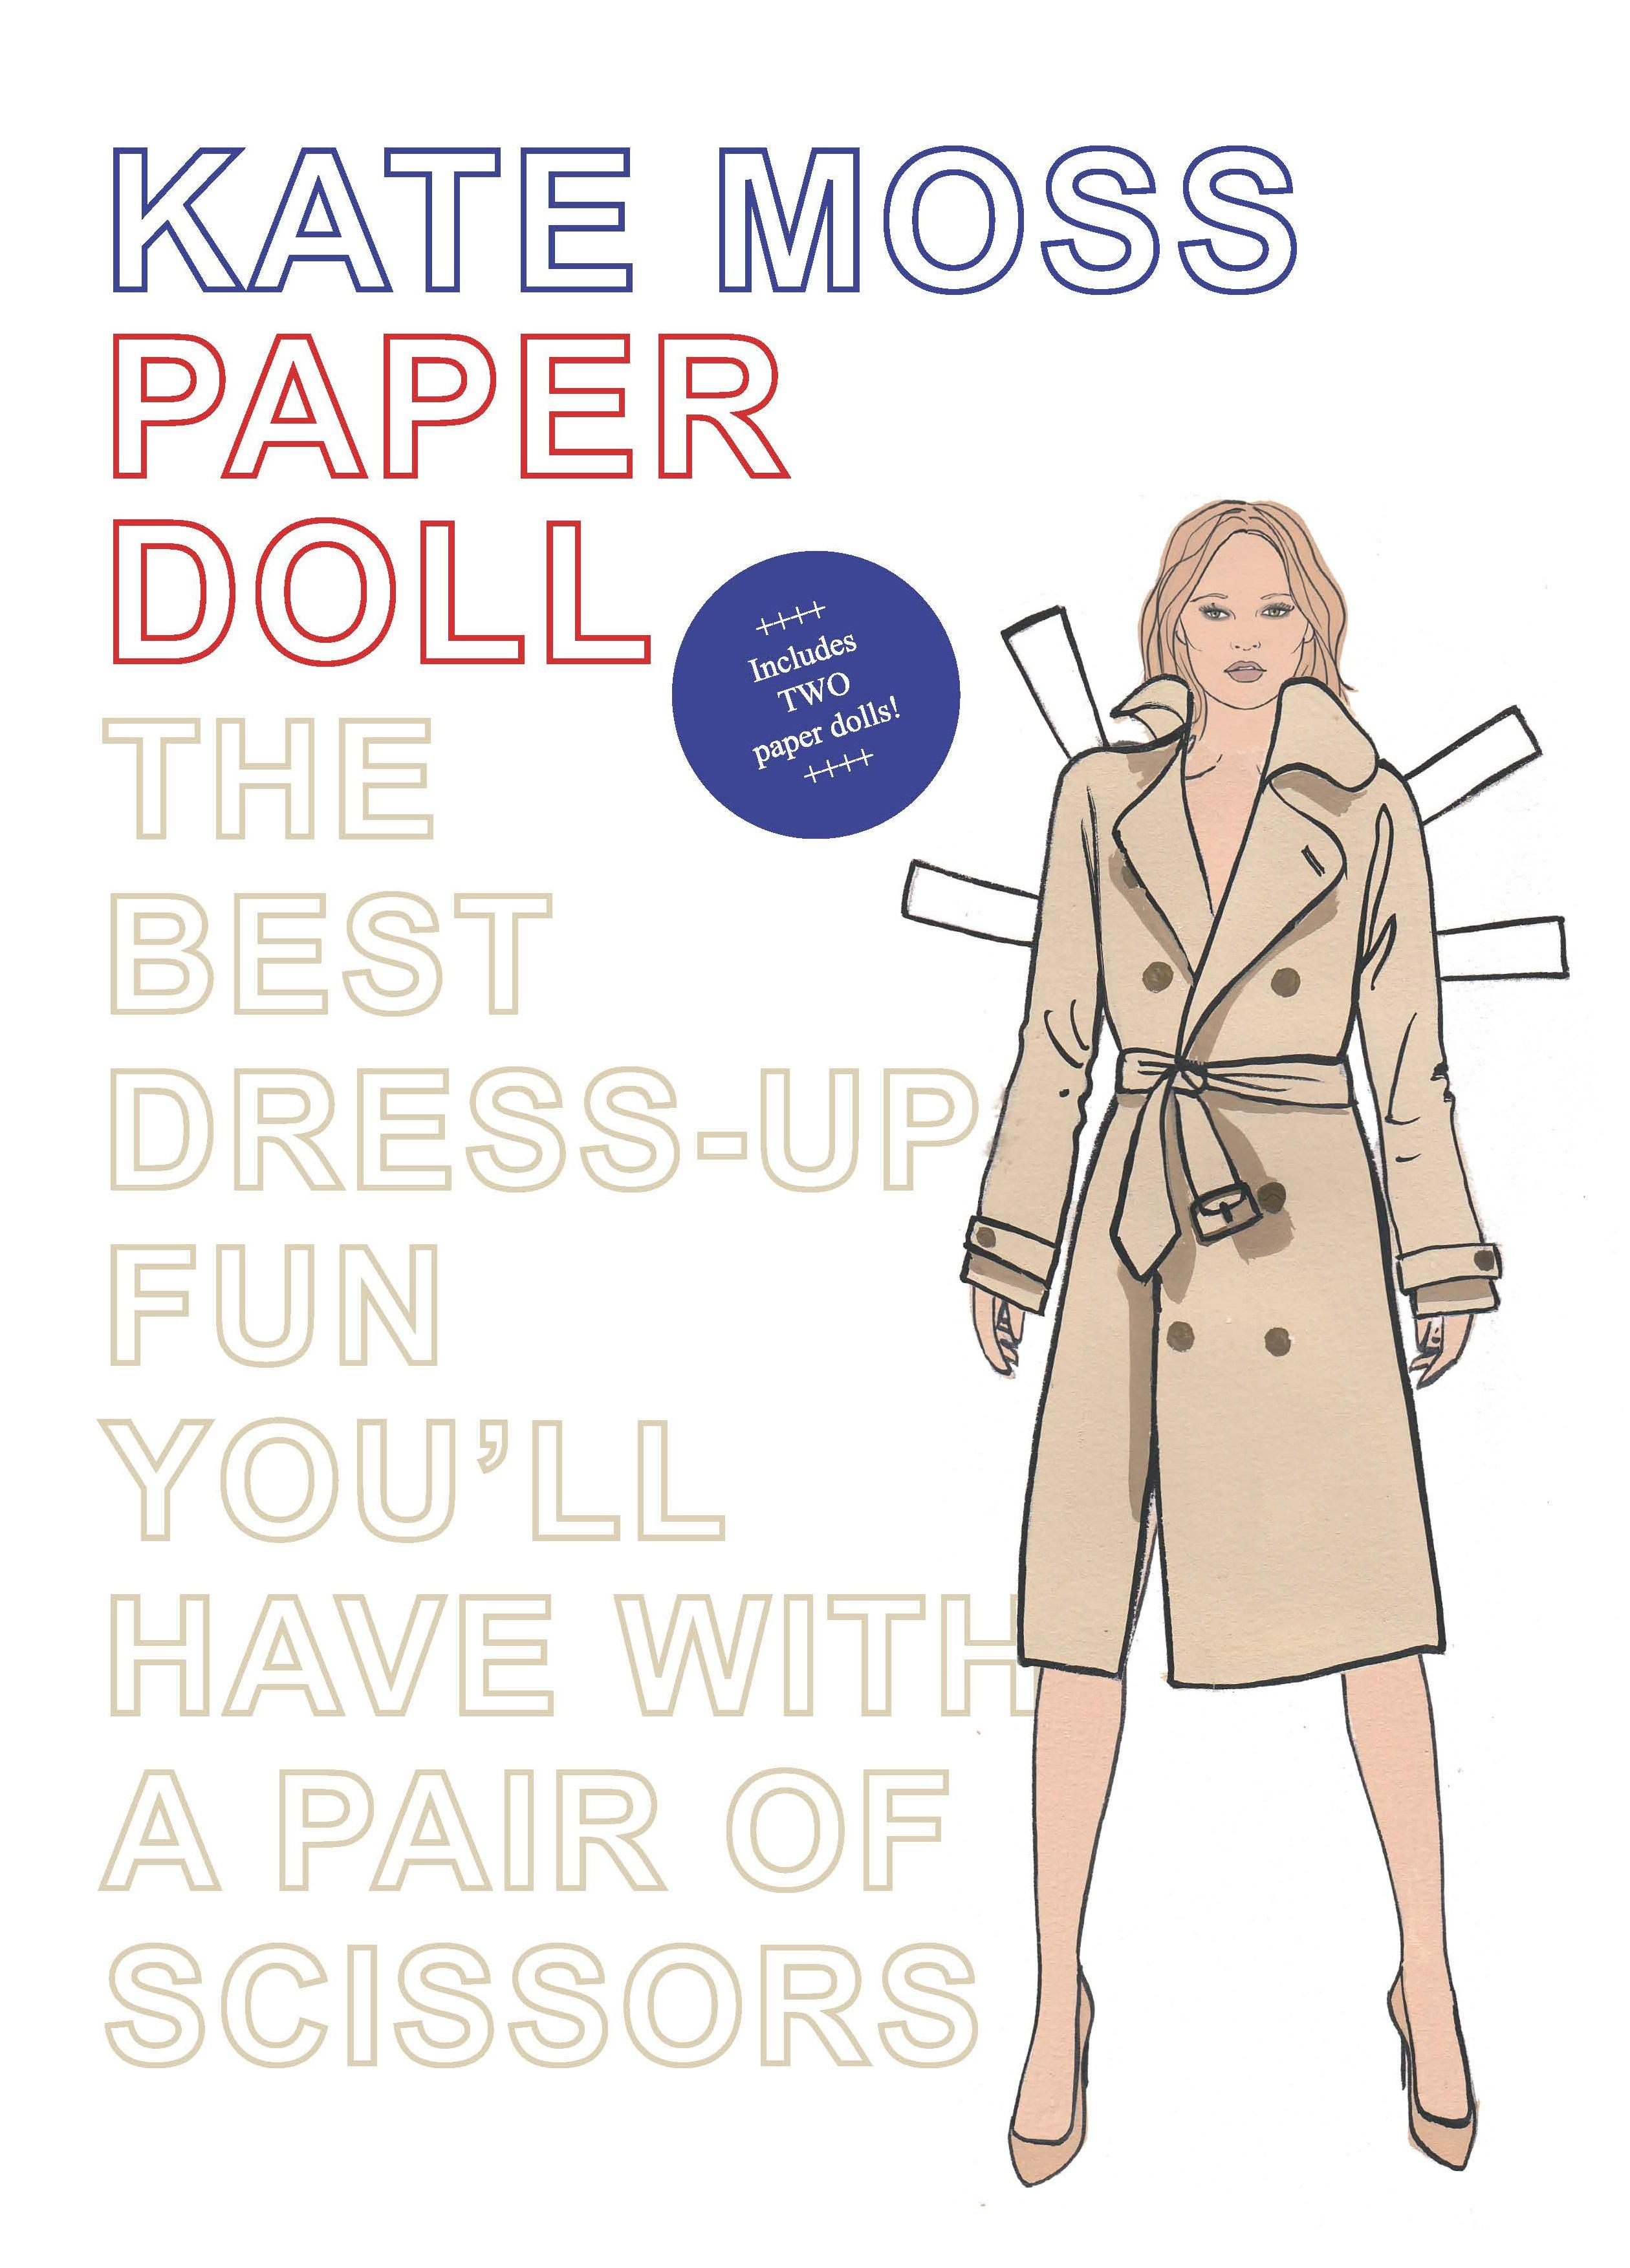 Kate moss paper dolls set